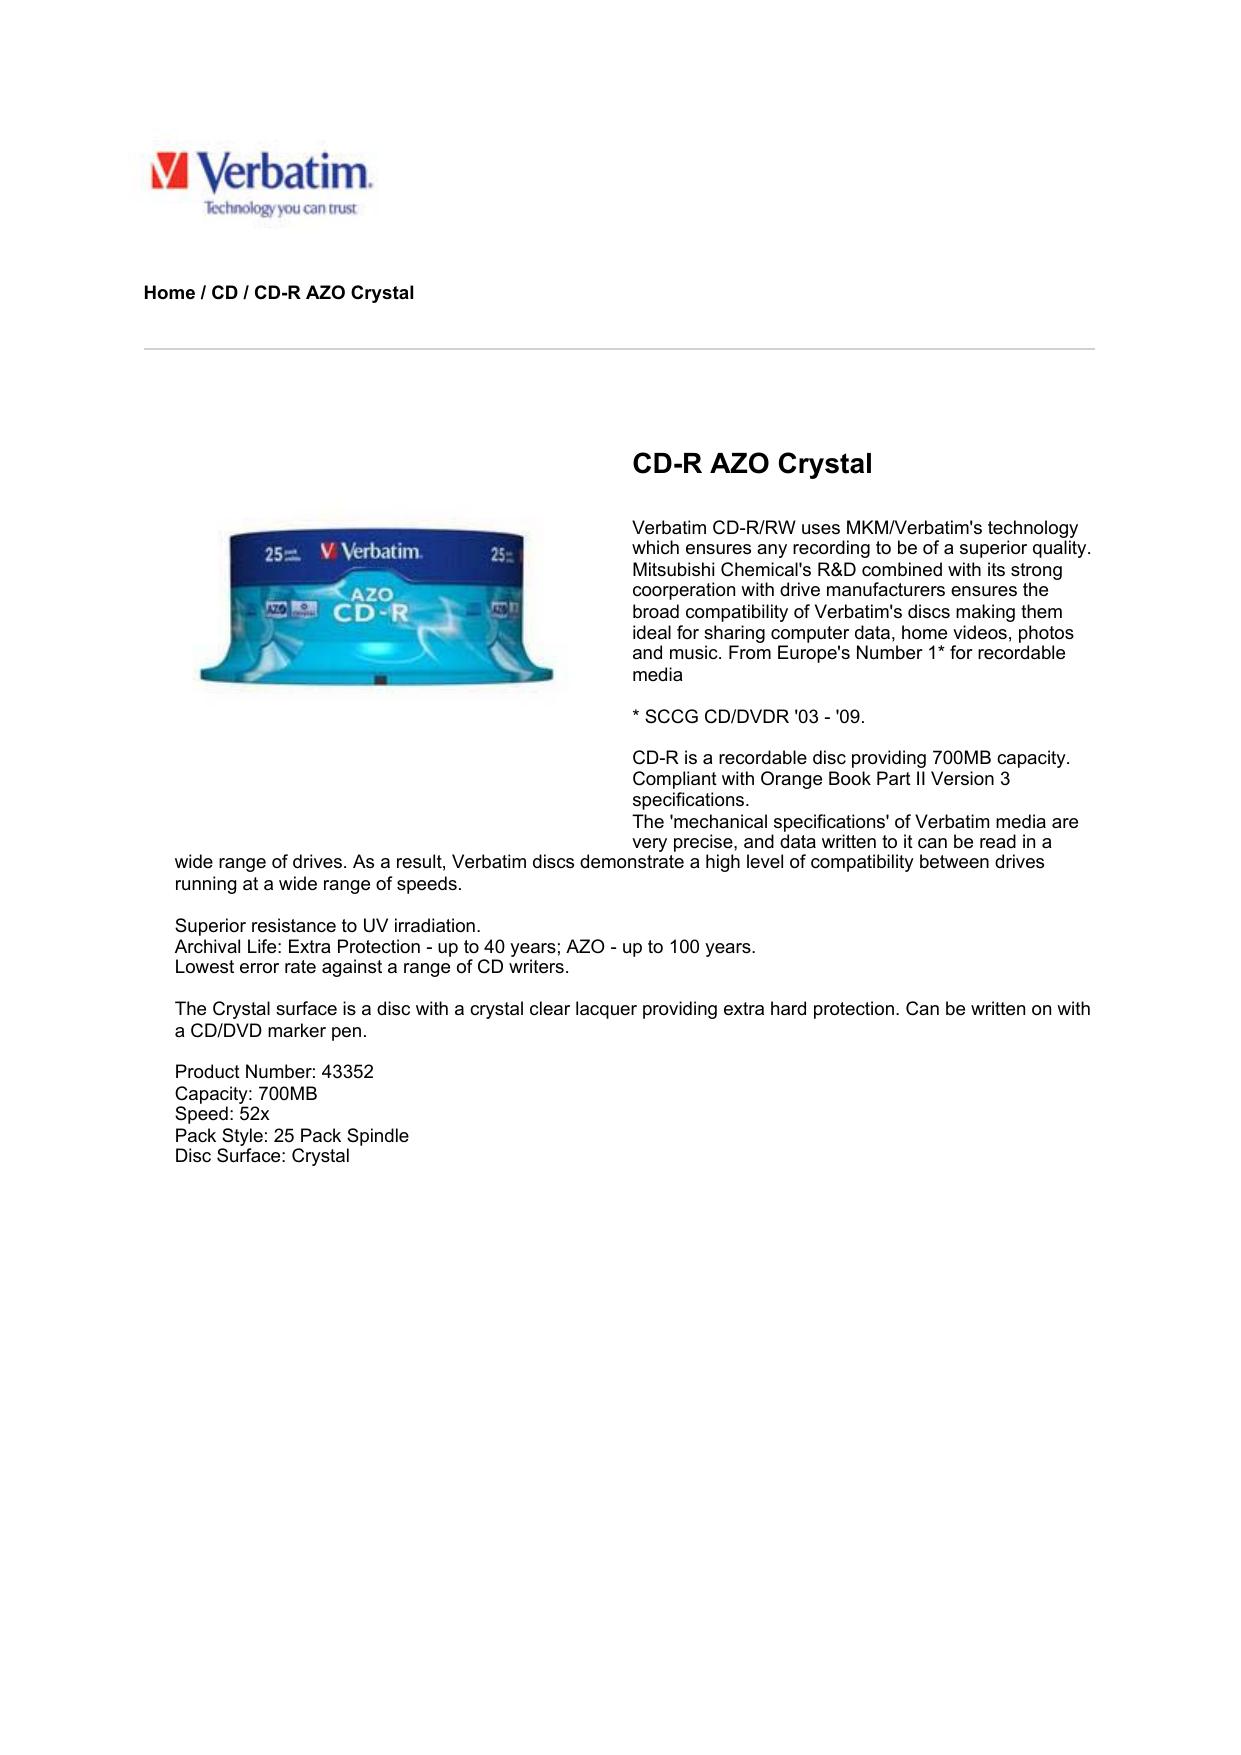 43352 Verbatim AZO CD-R 52X 700MB Crystal 25 Pack 25 Pack